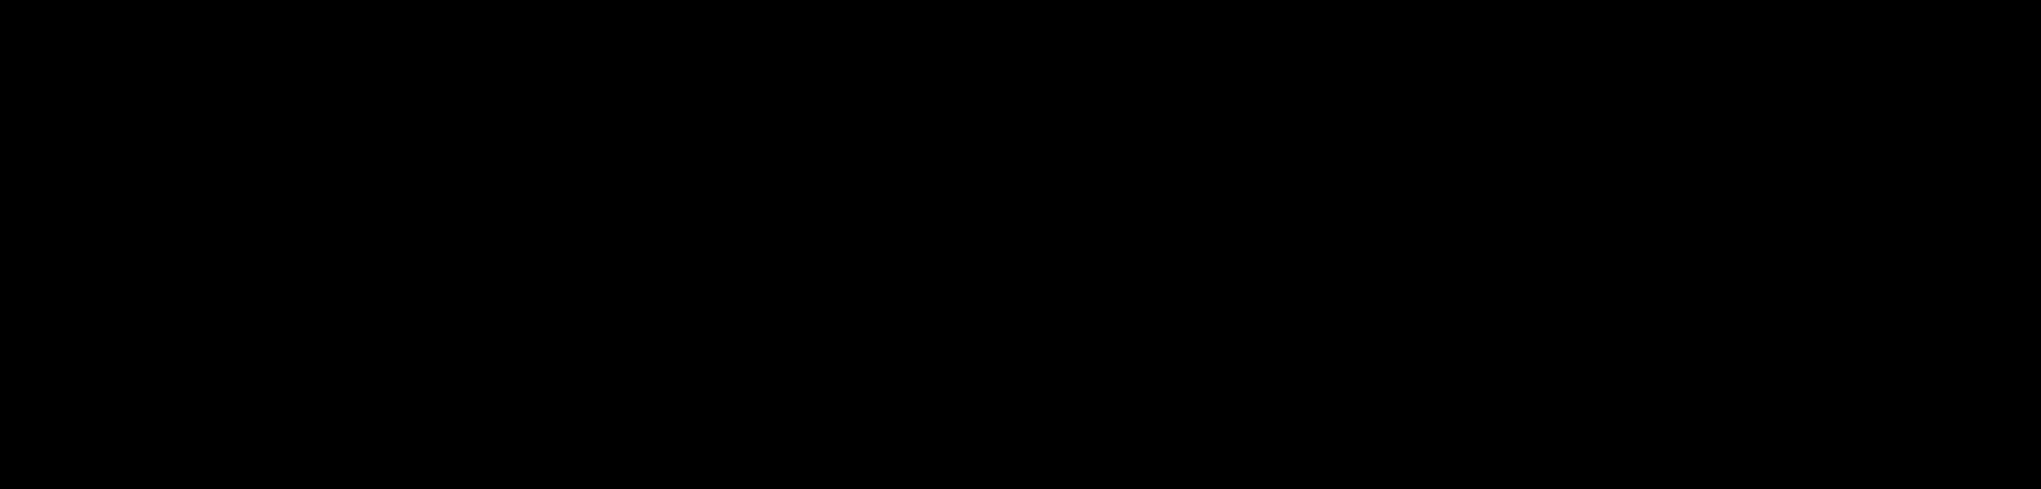 Jamie Grimstad logo